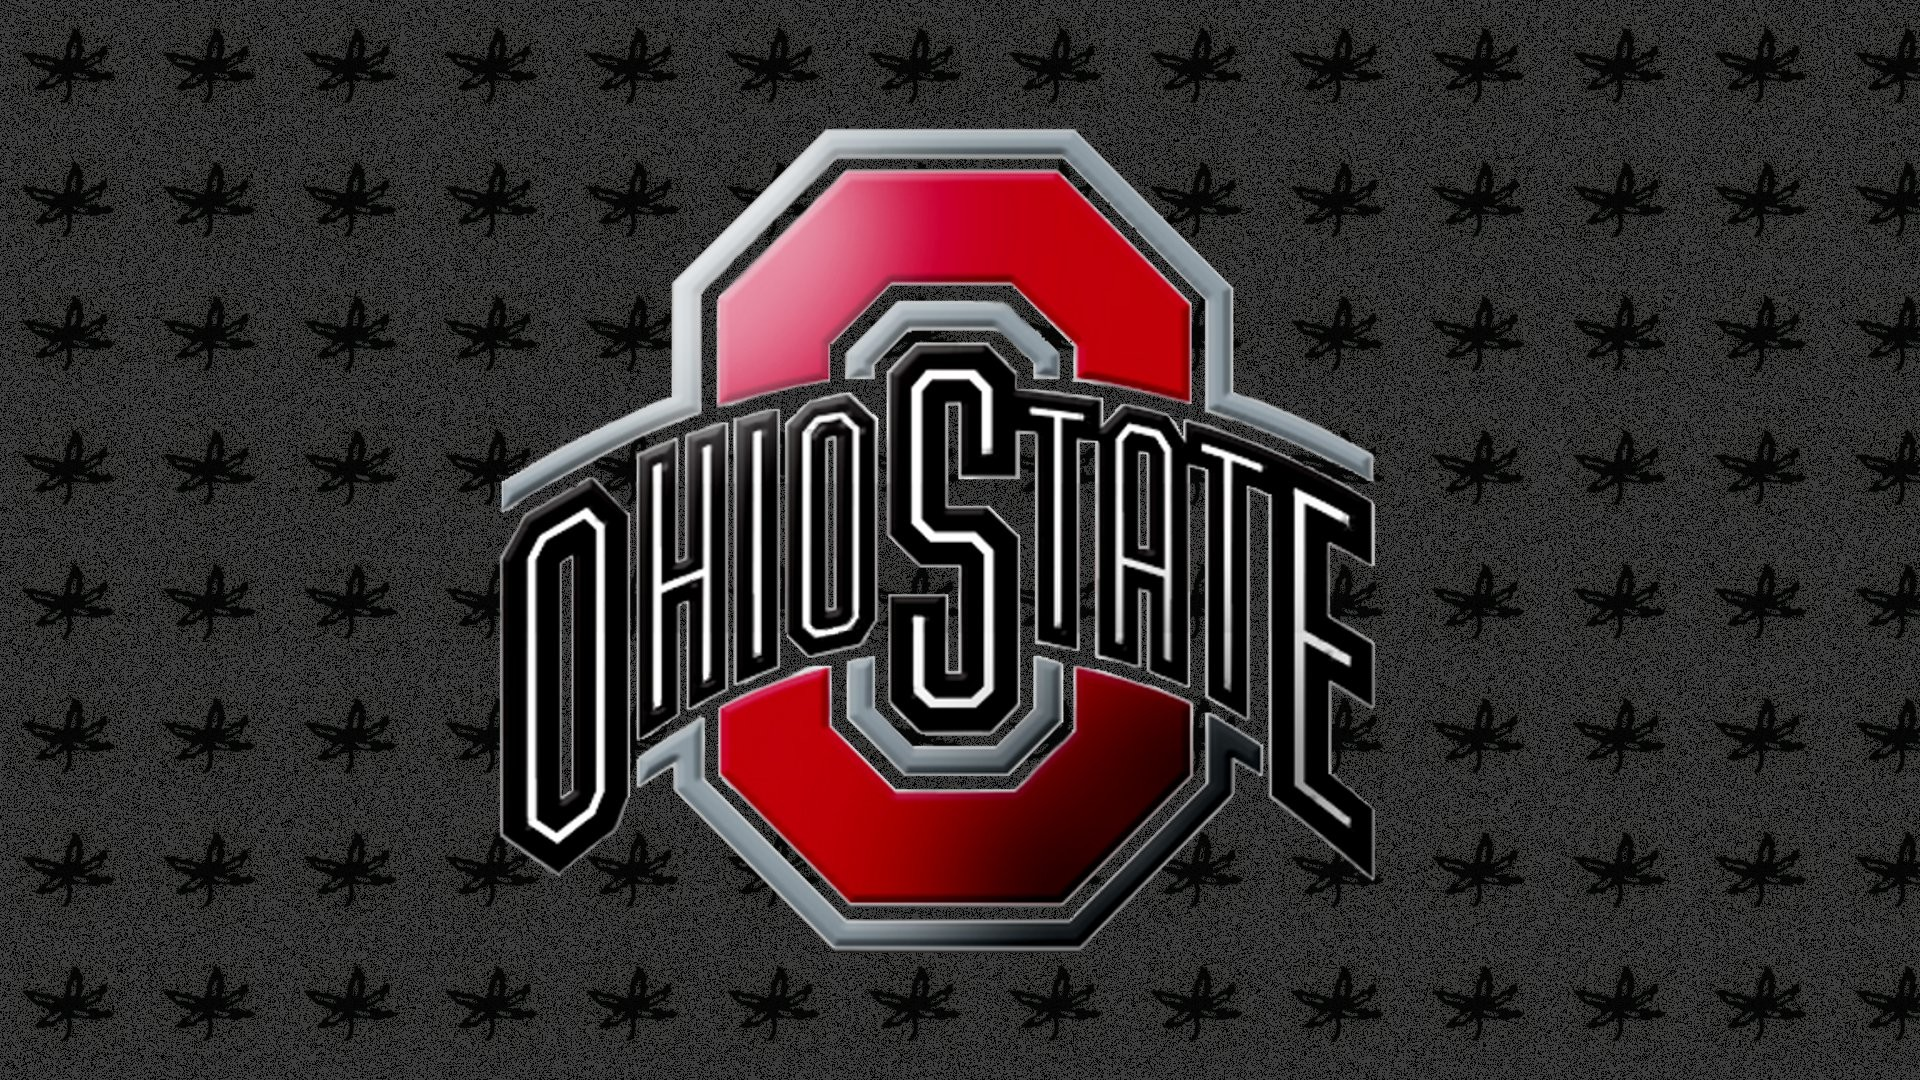 Ohio State Football OSU Desktop Wallpaper.